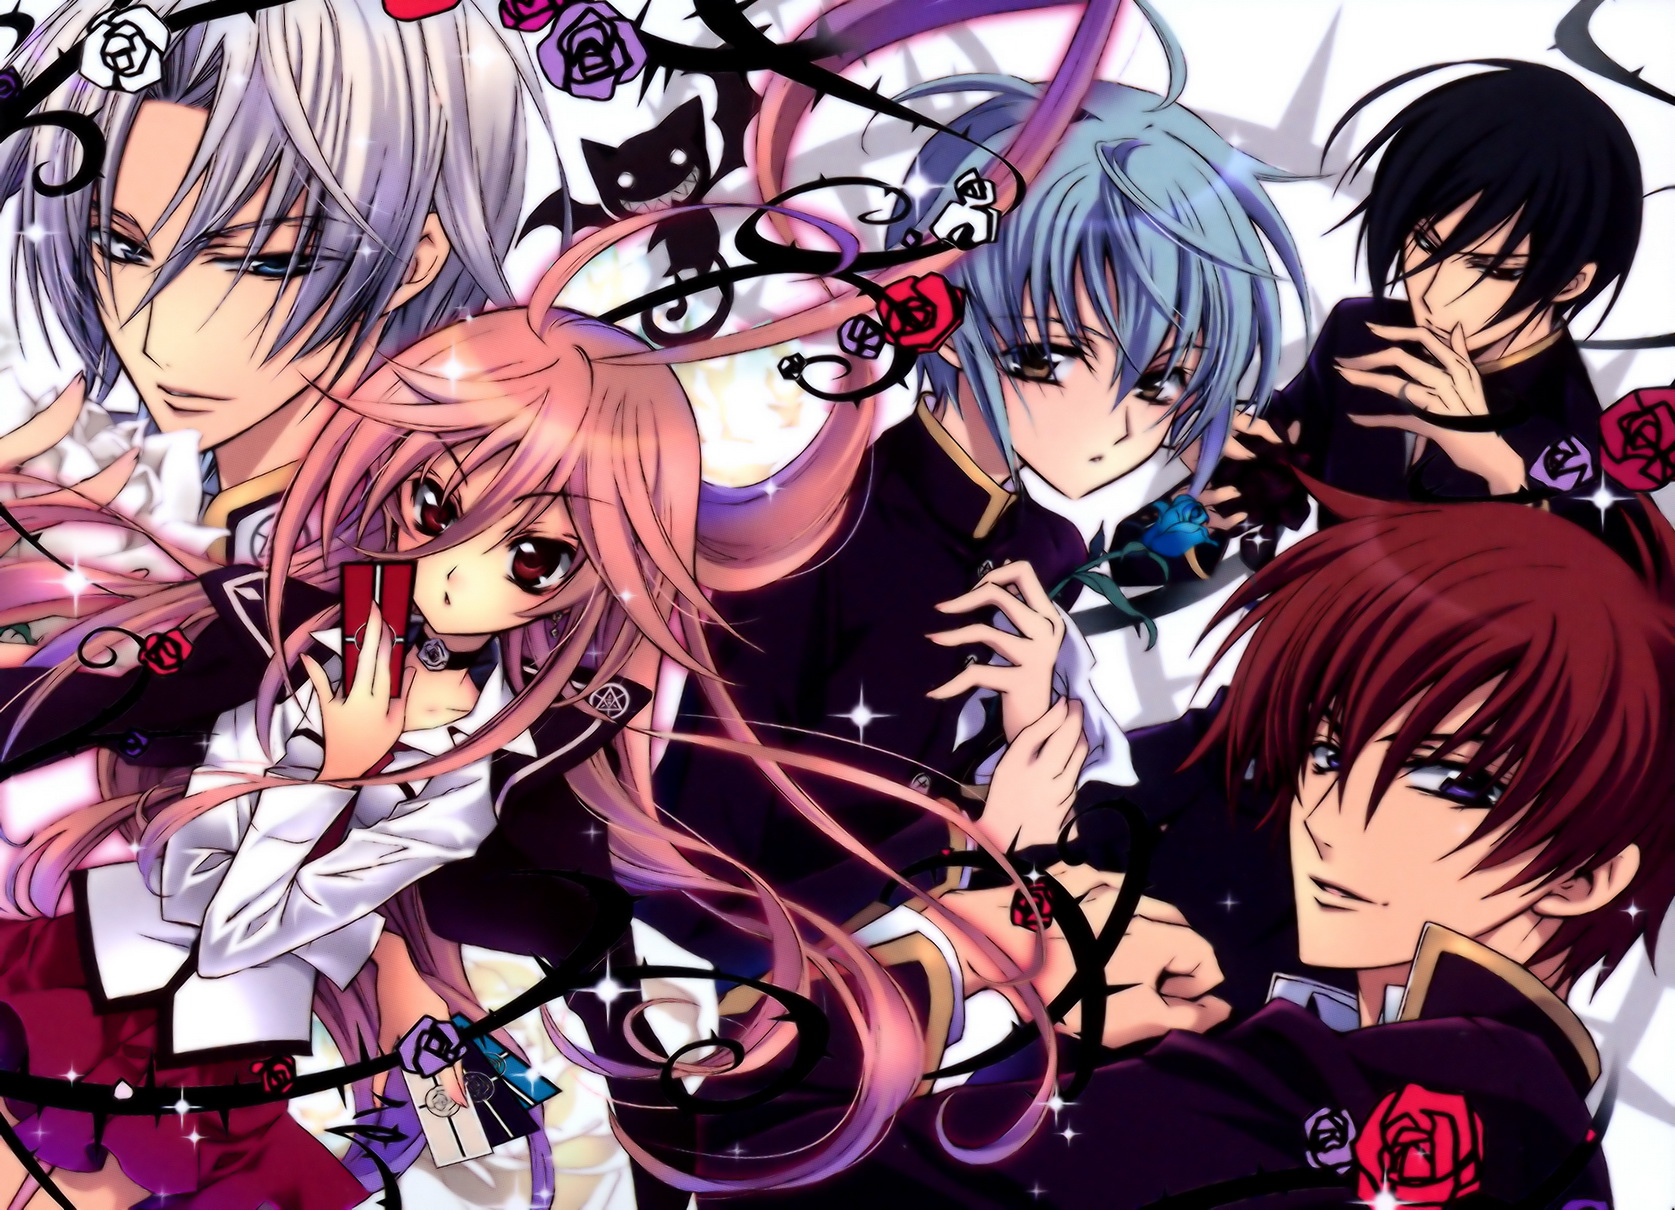 Hintergrundbilder Kiss Of Rose Princess Anime 1675x1210